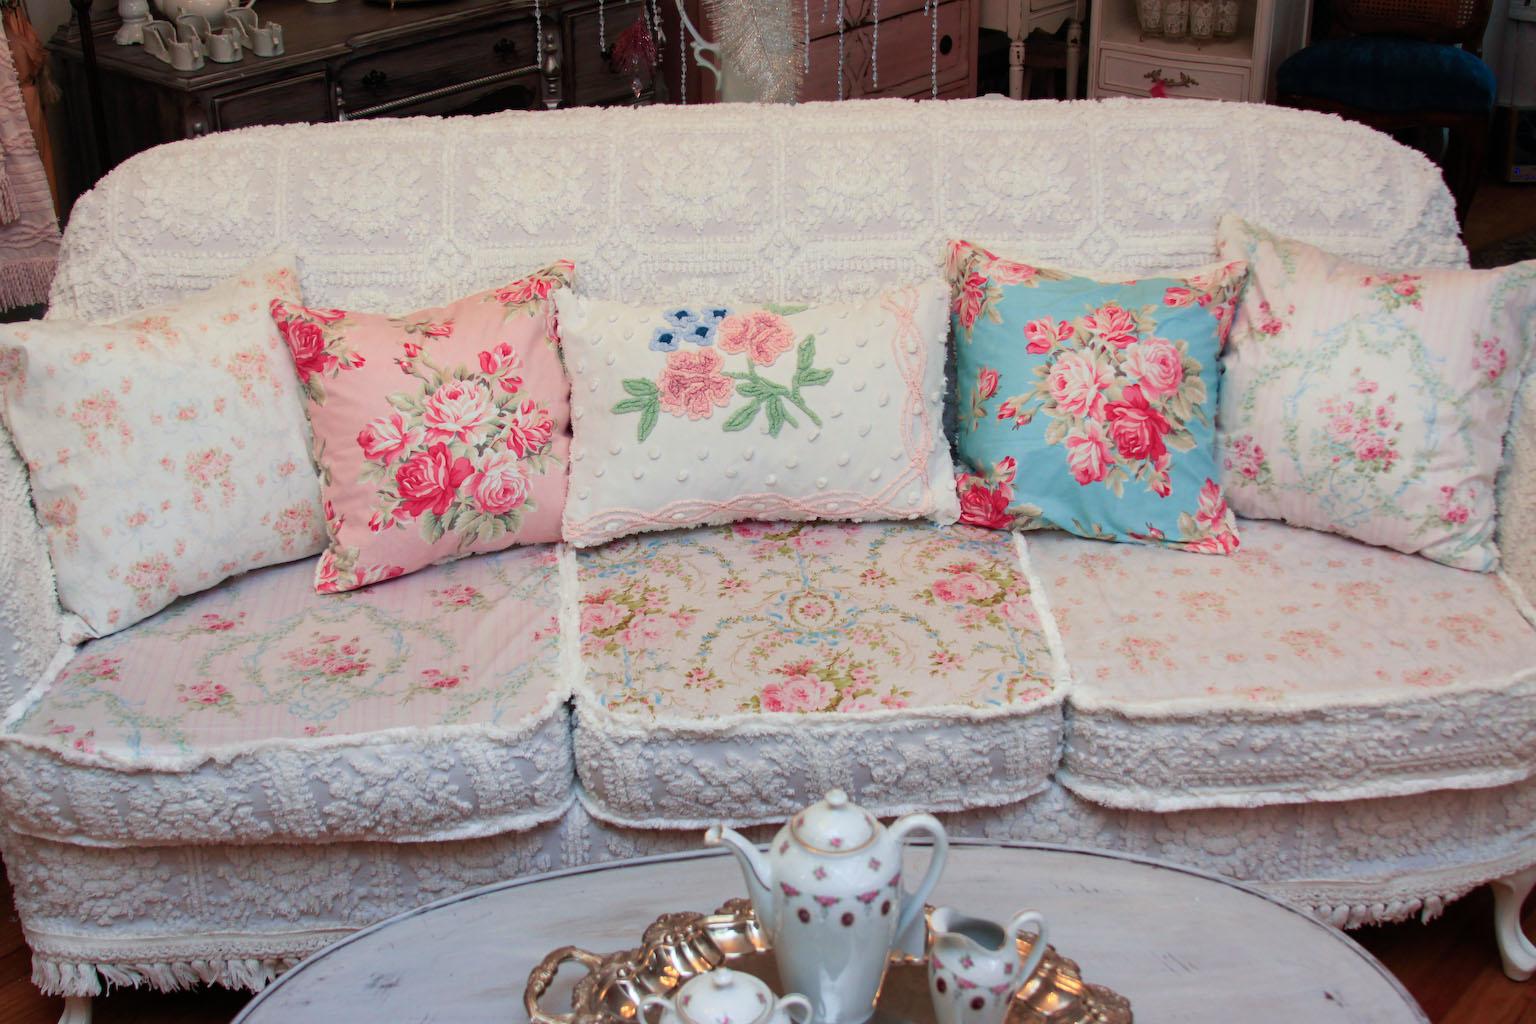 Vintage Chic Furniture Schenectady NY: OMG! Antique Sofa